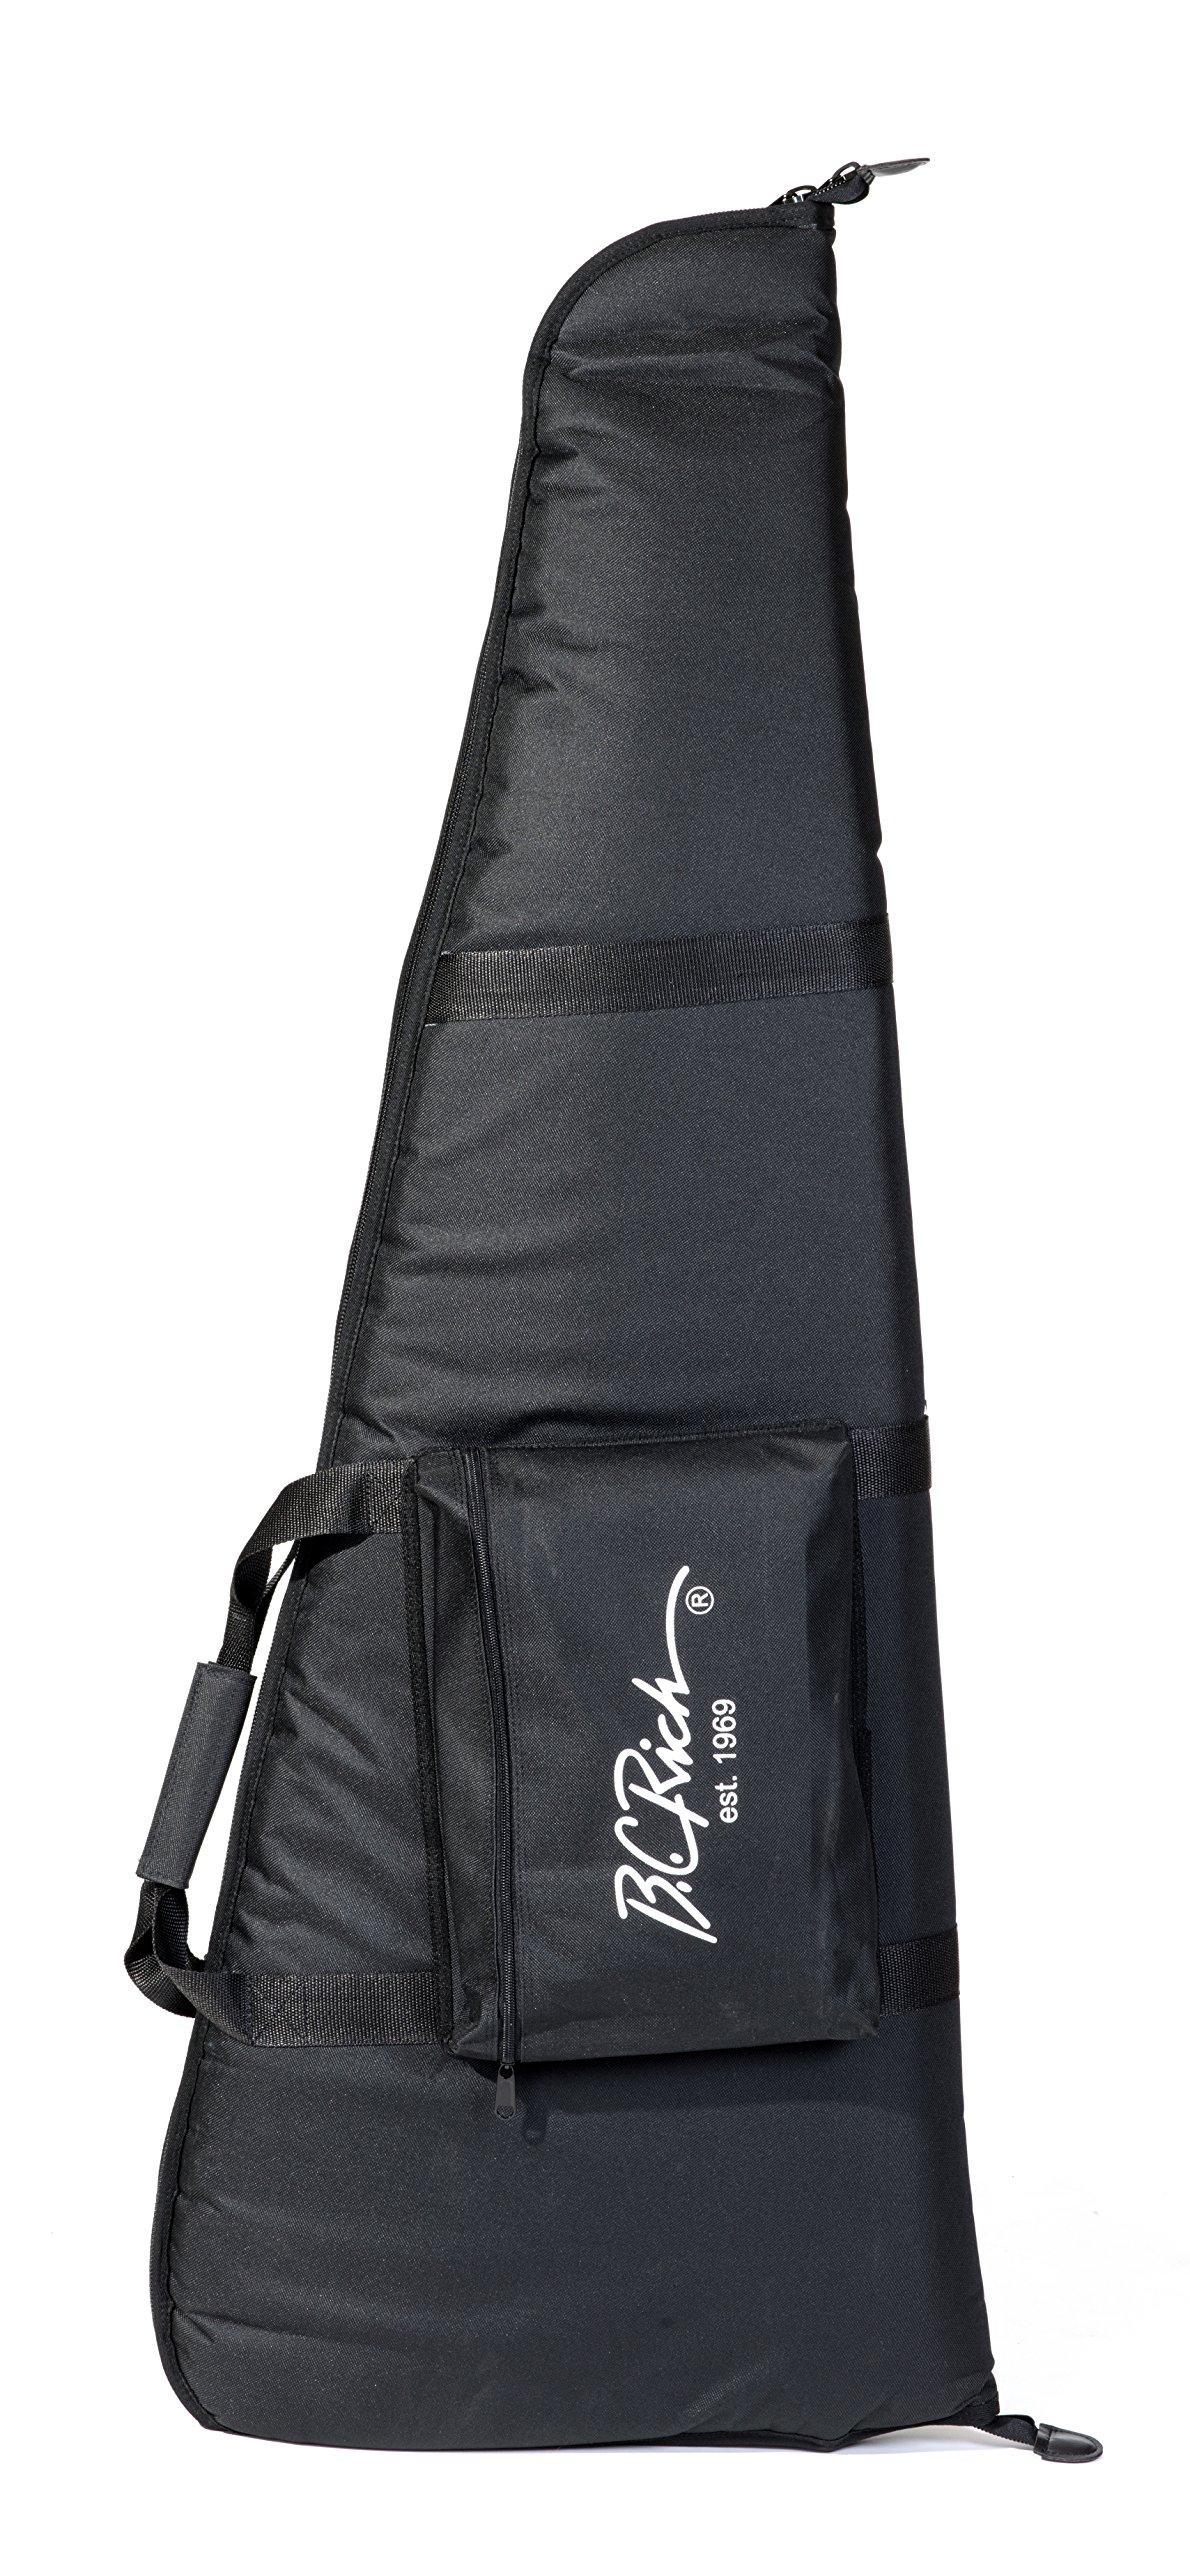 B.C. Rich Gig Bag for Warlock, Warbeast, Junior V & Bass Models, Deluxe Padding